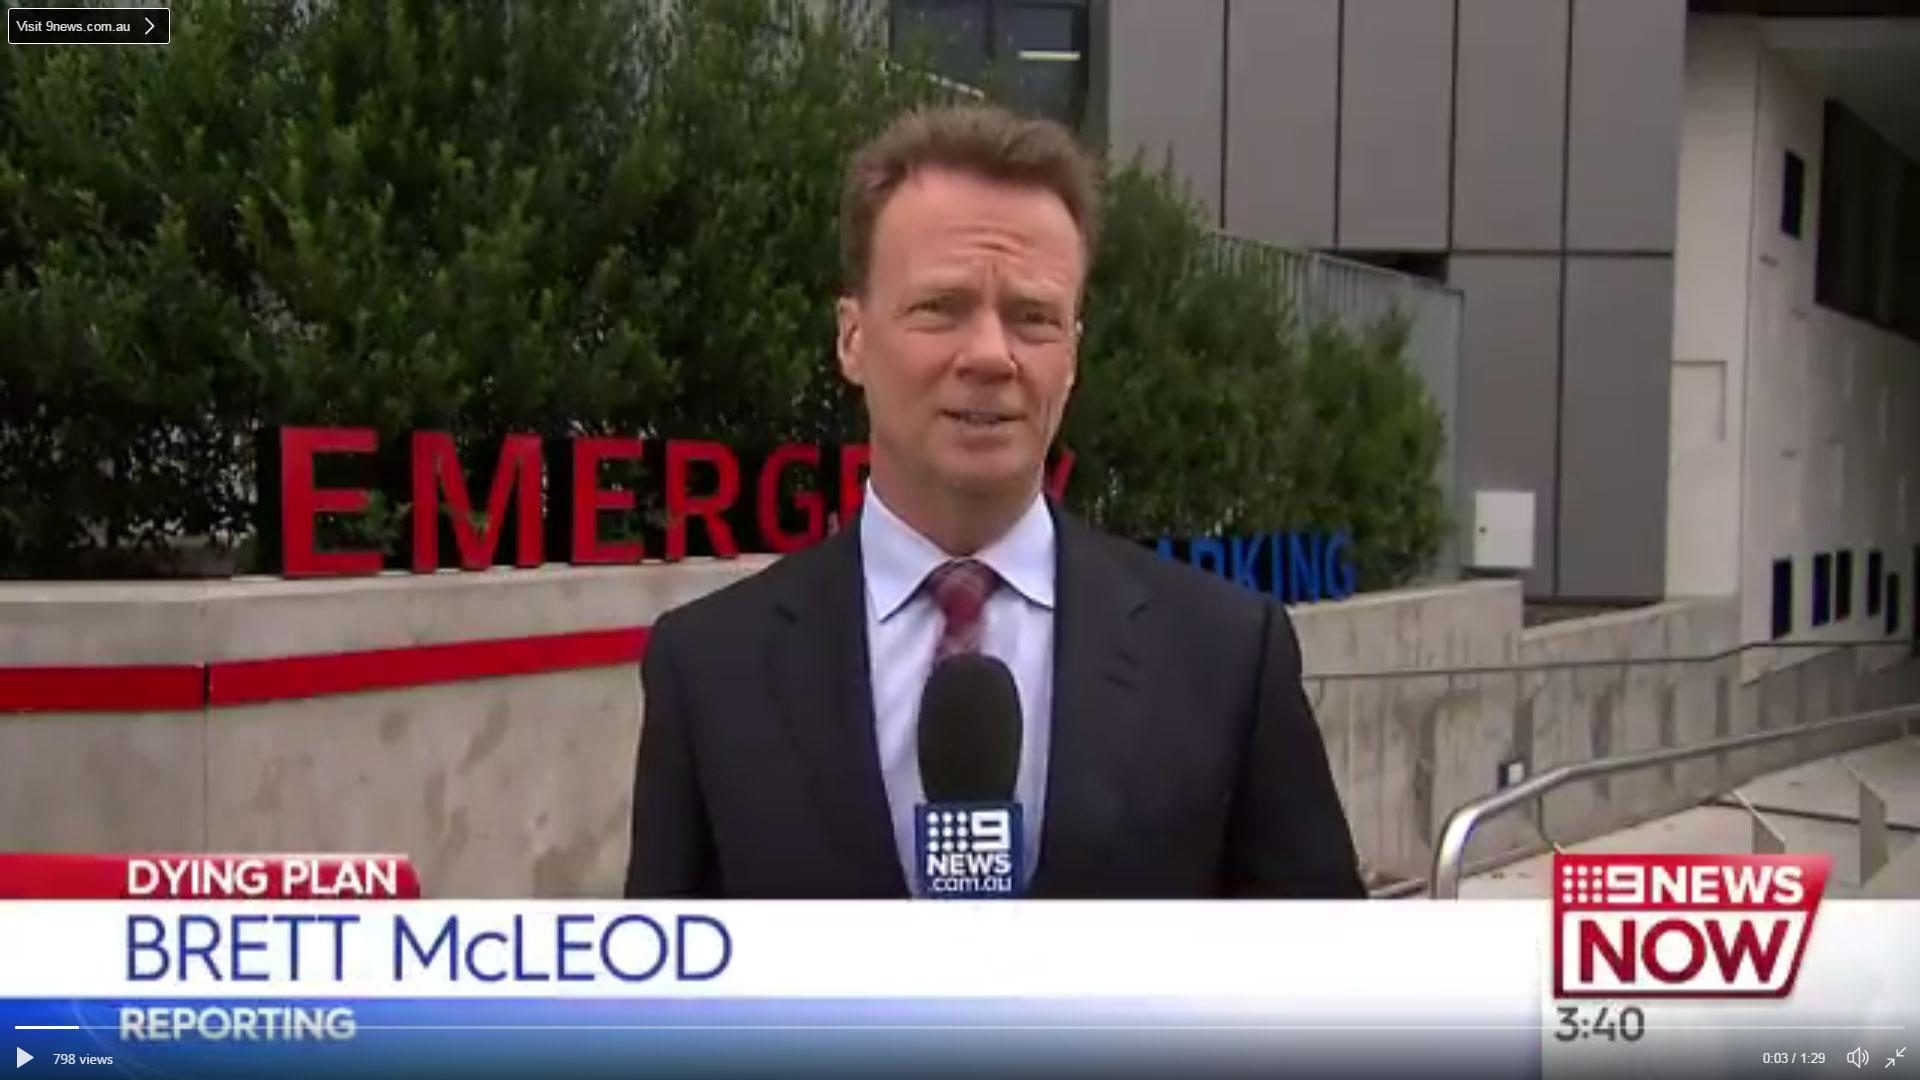 Brett Mcleod, a nine news reporter standing outside an emergency department.